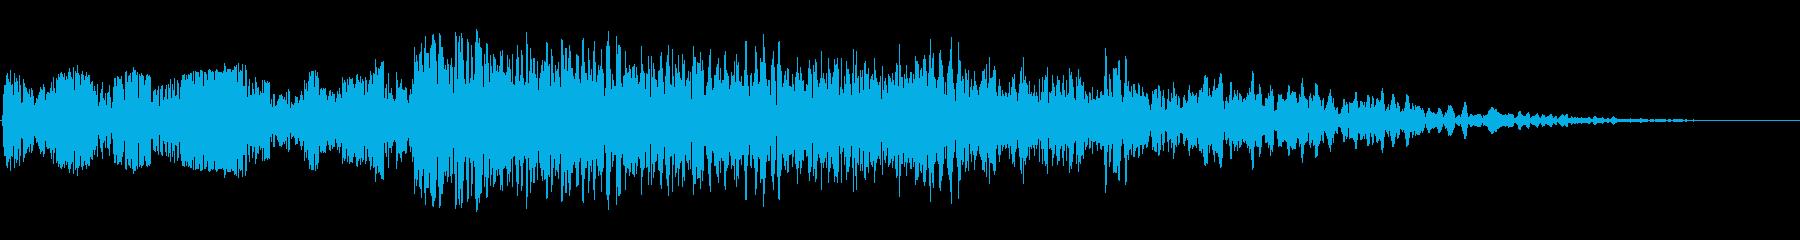 ZapAccents EC09_42_4の再生済みの波形